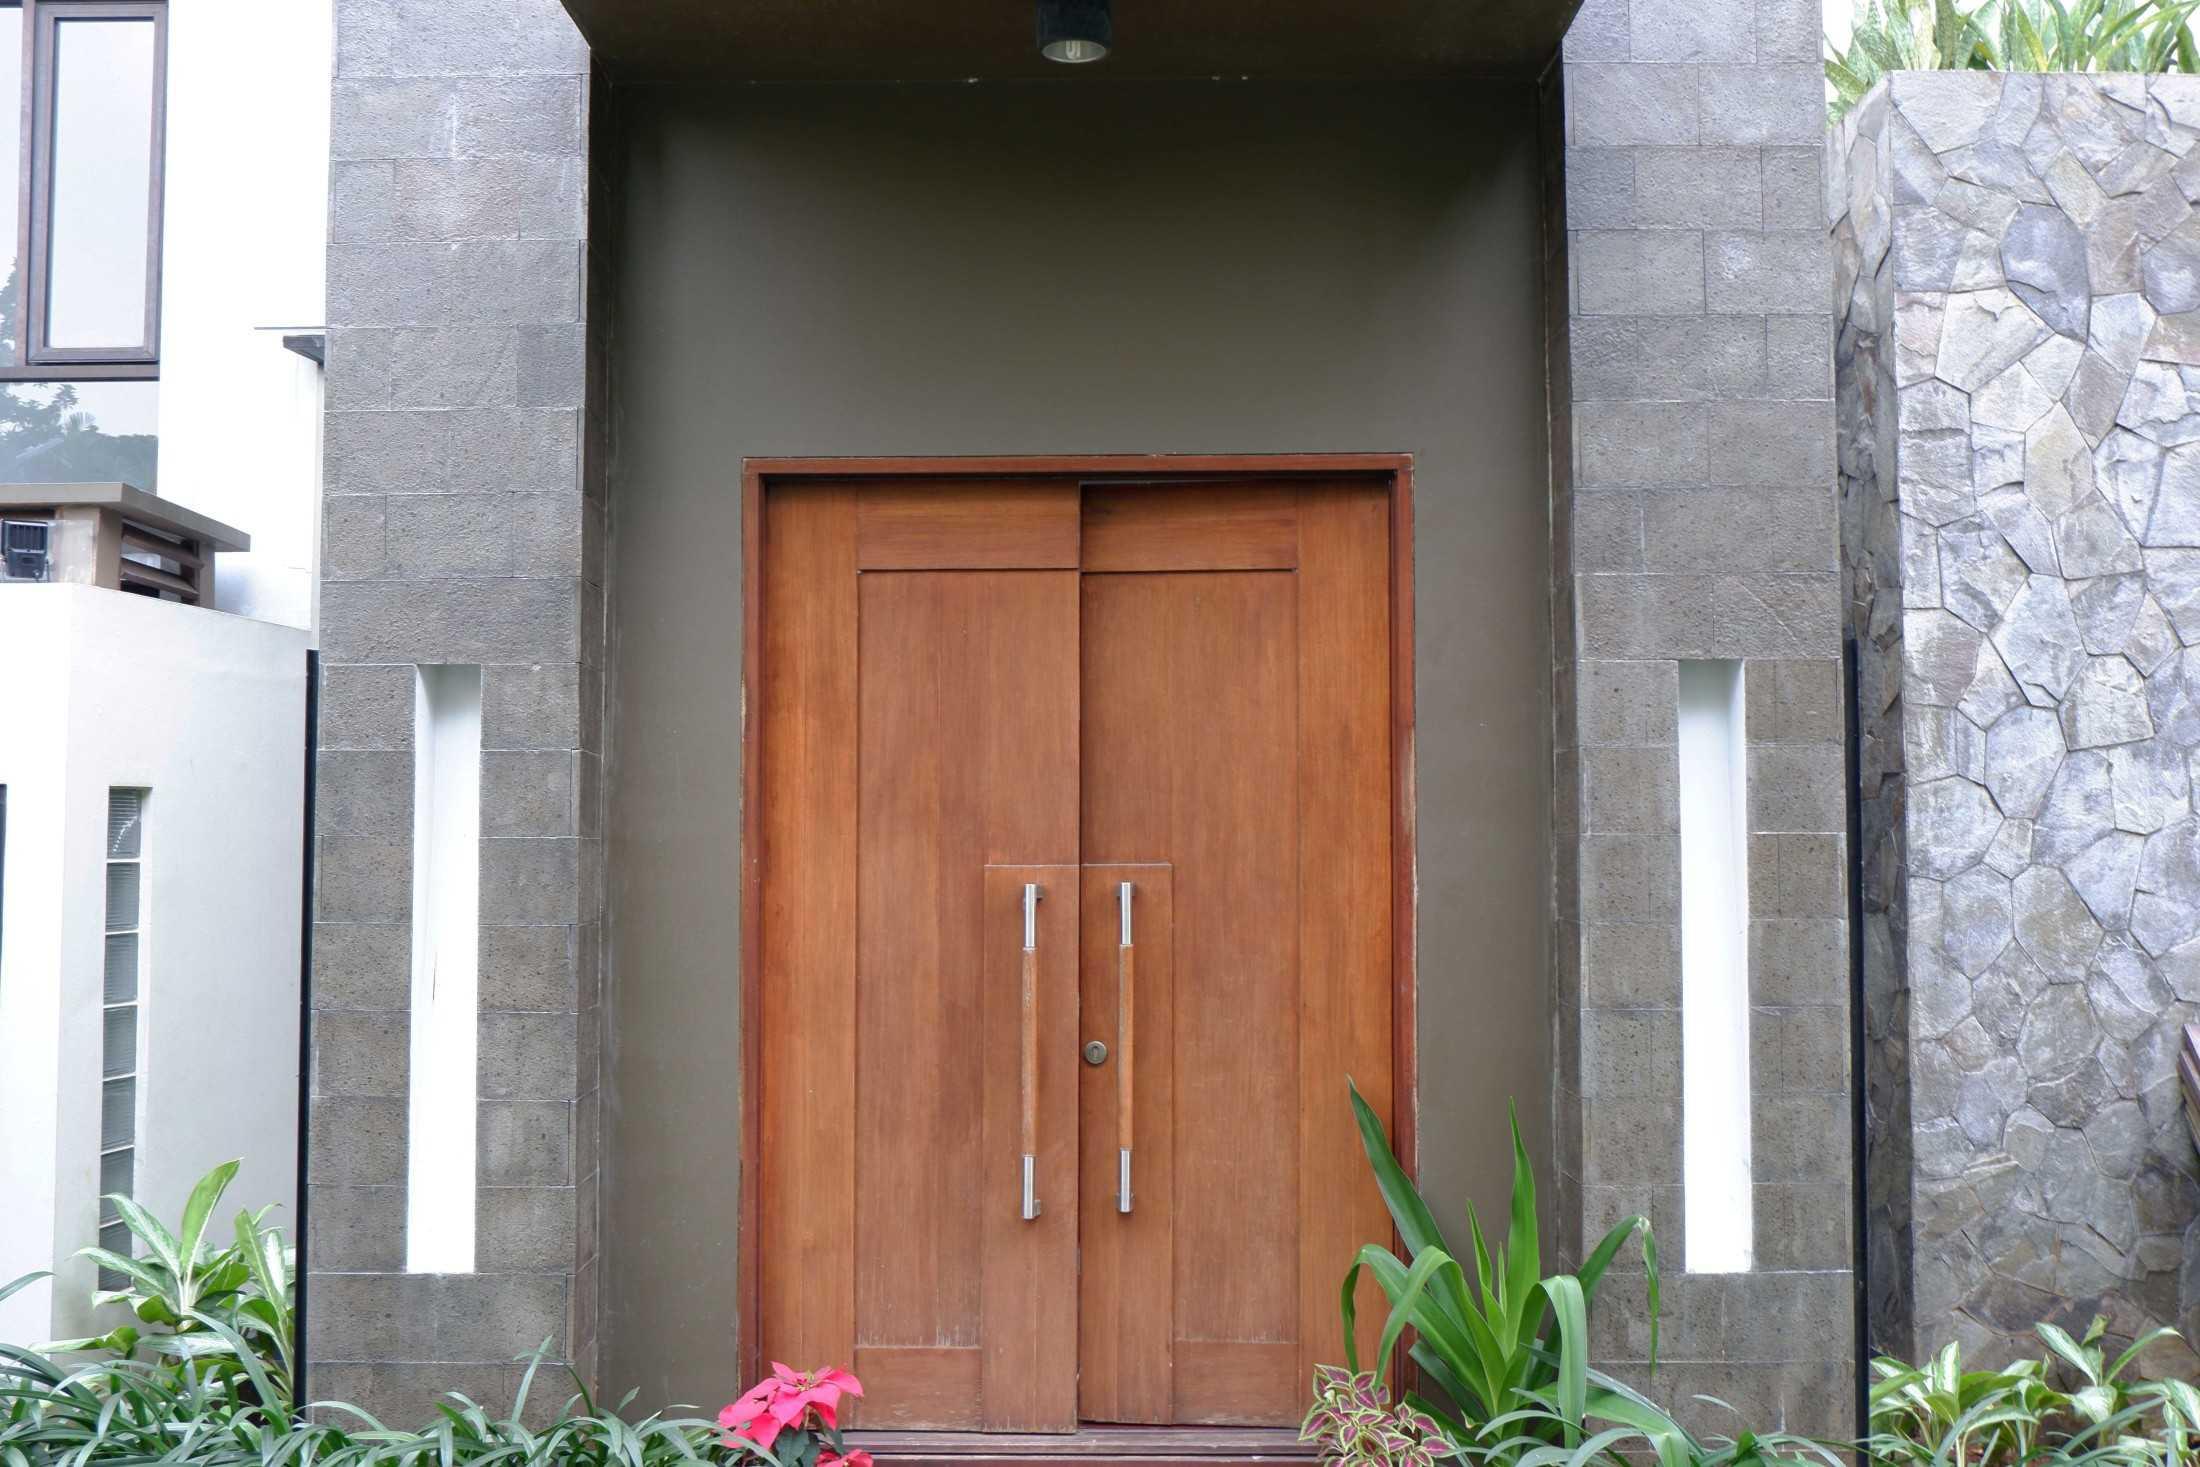 Lokative Studio Renovasi Rumah Cempaka Jakarta, Daerah Khusus Ibukota Jakarta, Indonesia Jakarta, Daerah Khusus Ibukota Jakarta, Indonesia Lokative-Studio-Renovasi-Rumah-Cempaka  97477